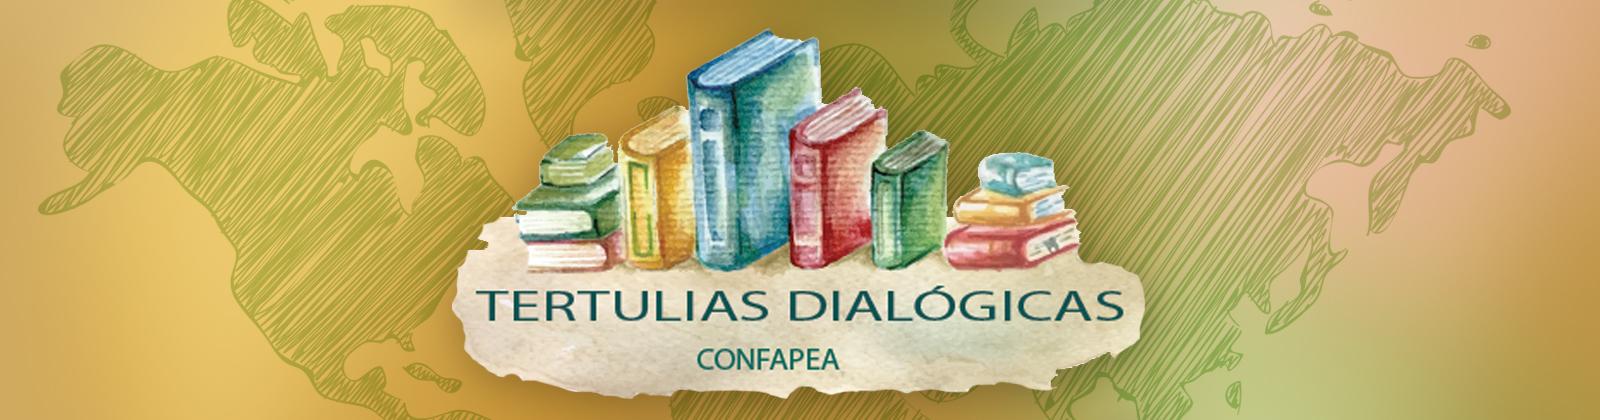 CONFAPEA - Tertulias Dialógicas